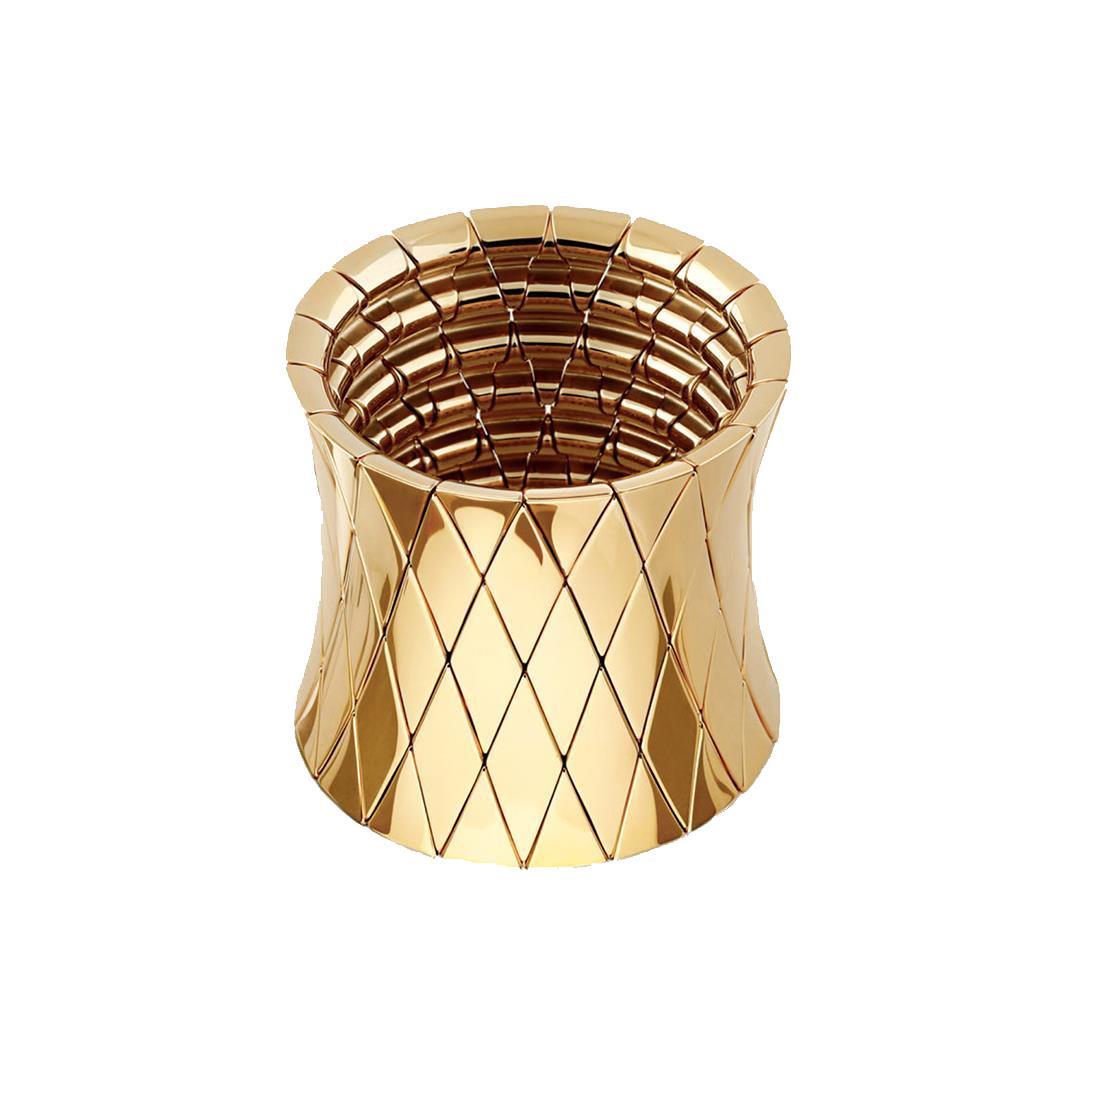 Bracciale elastico in ceramica dorata - ROBERTO DEMEGLIO